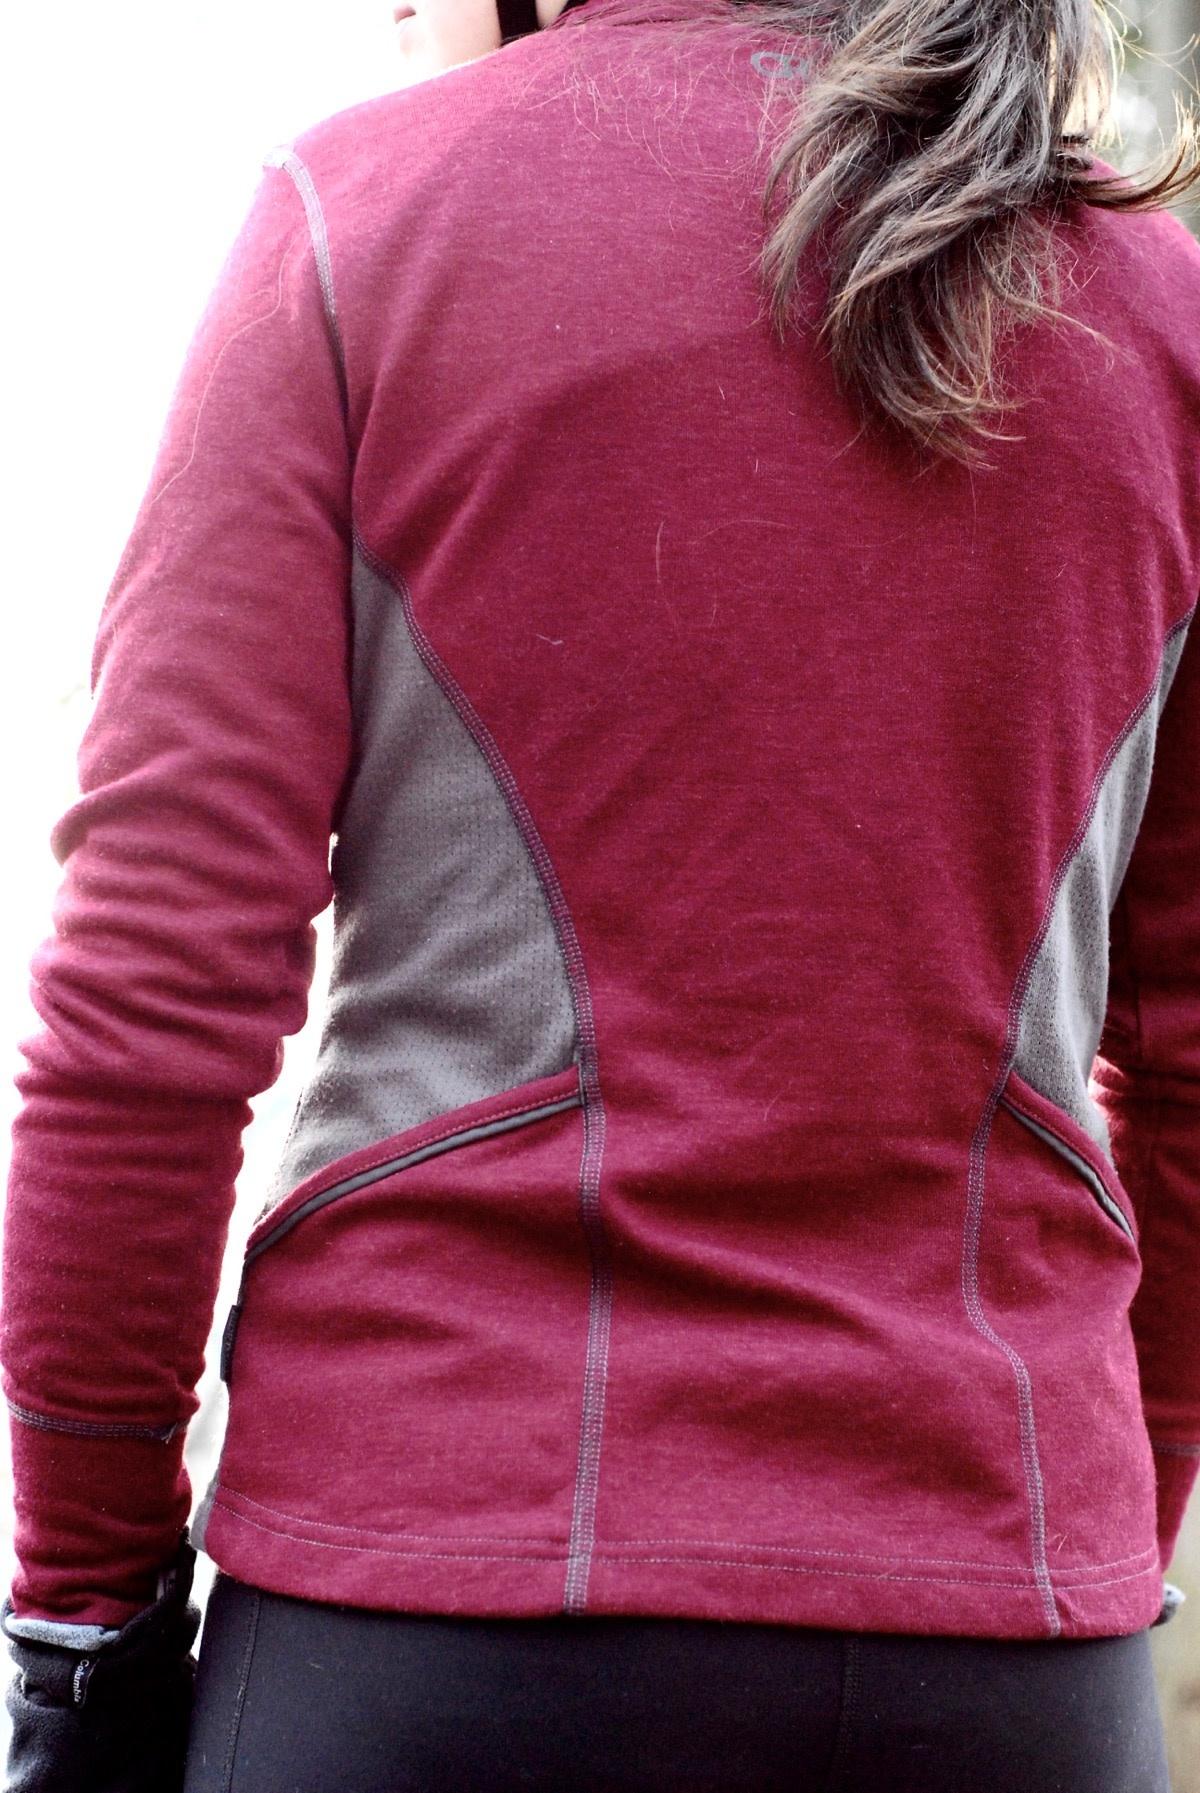 Club Ride Club Ride, Queen Anne, Long sleeve shirt, Women's, (WJQA501), Porto Red, M